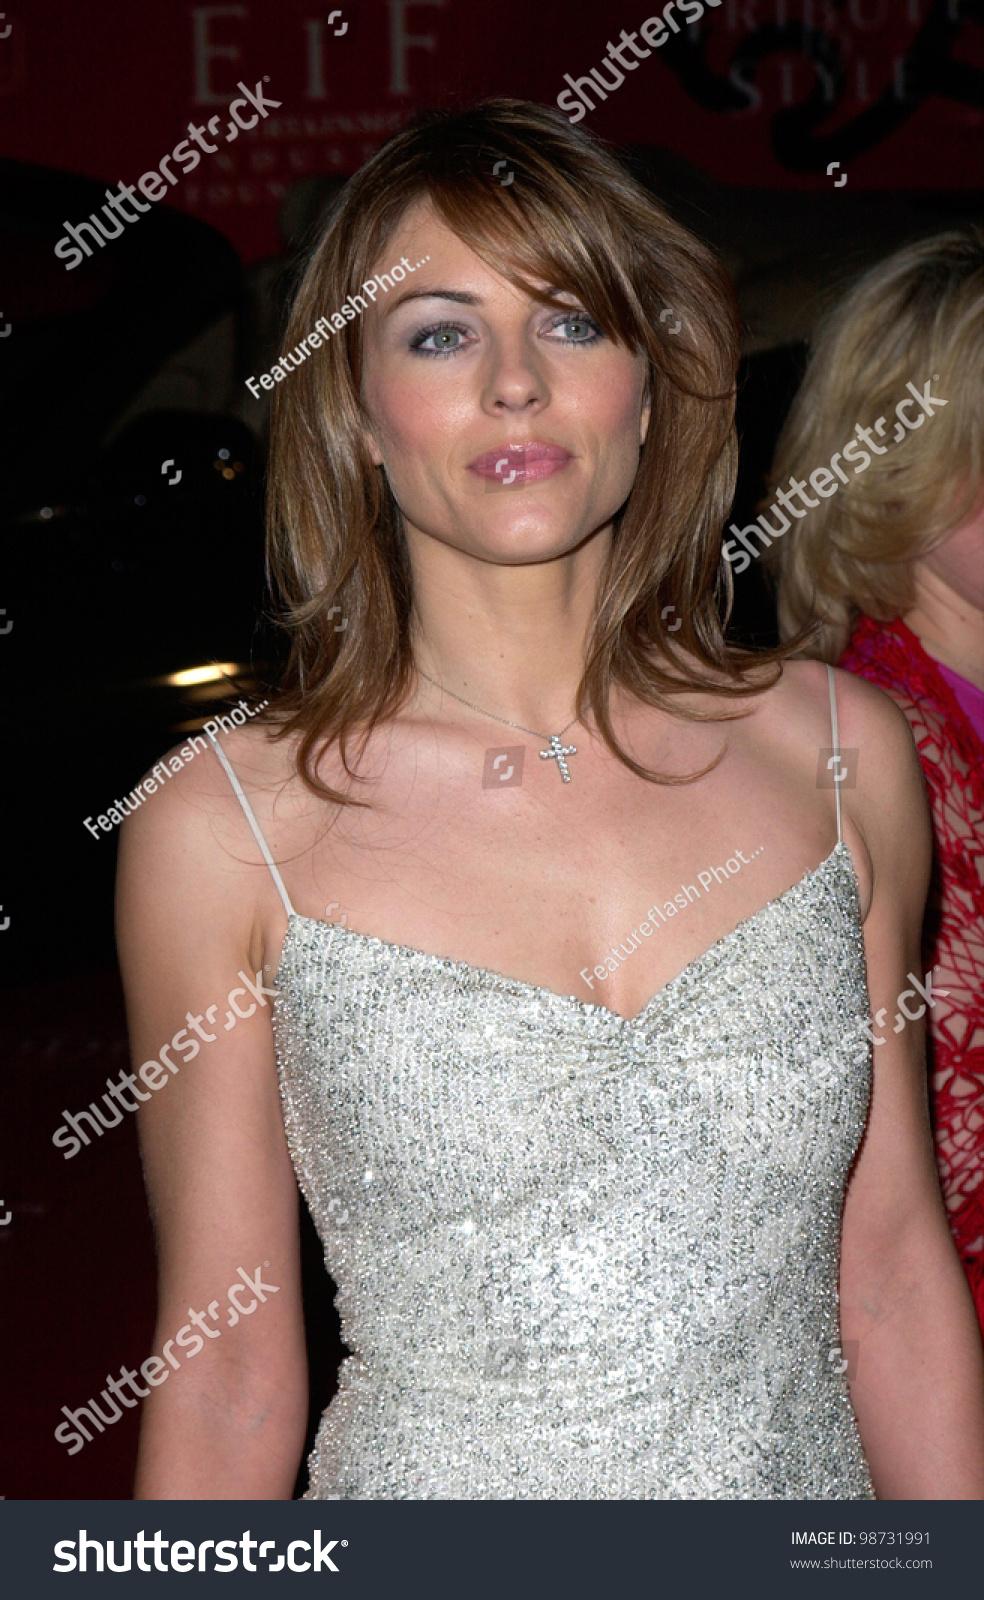 photo Julia Hurley (actress)